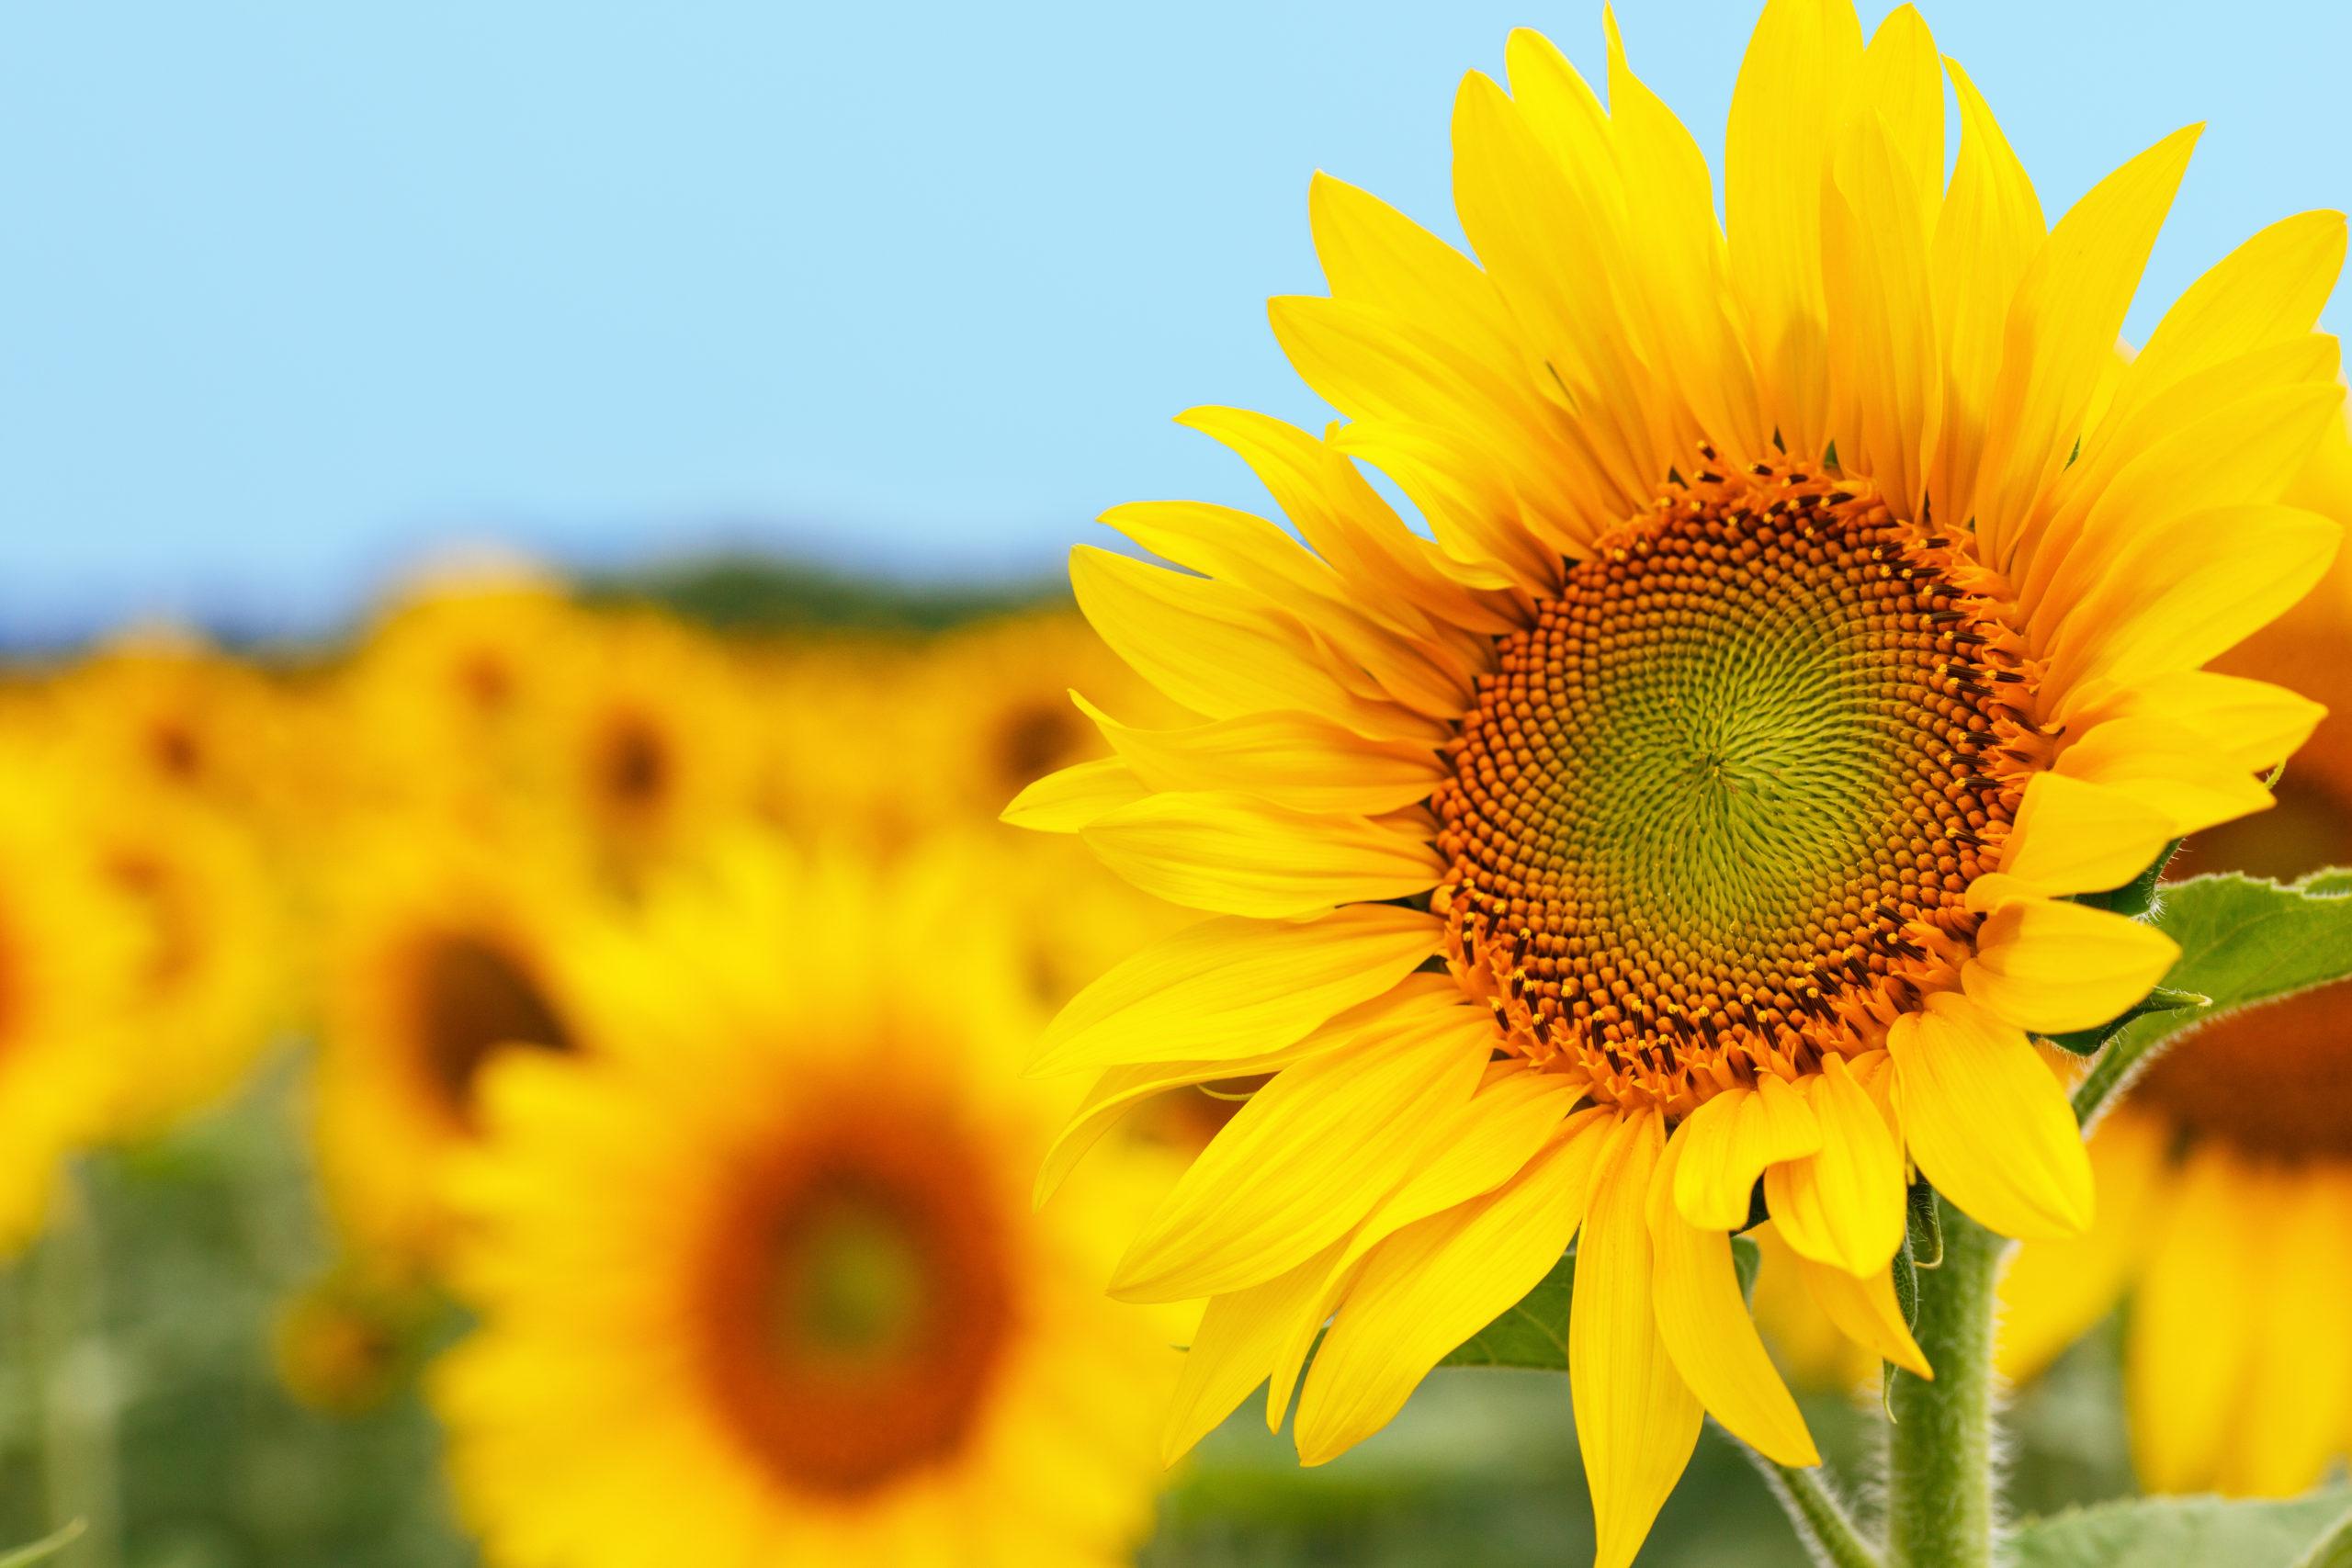 One sunflower on white background